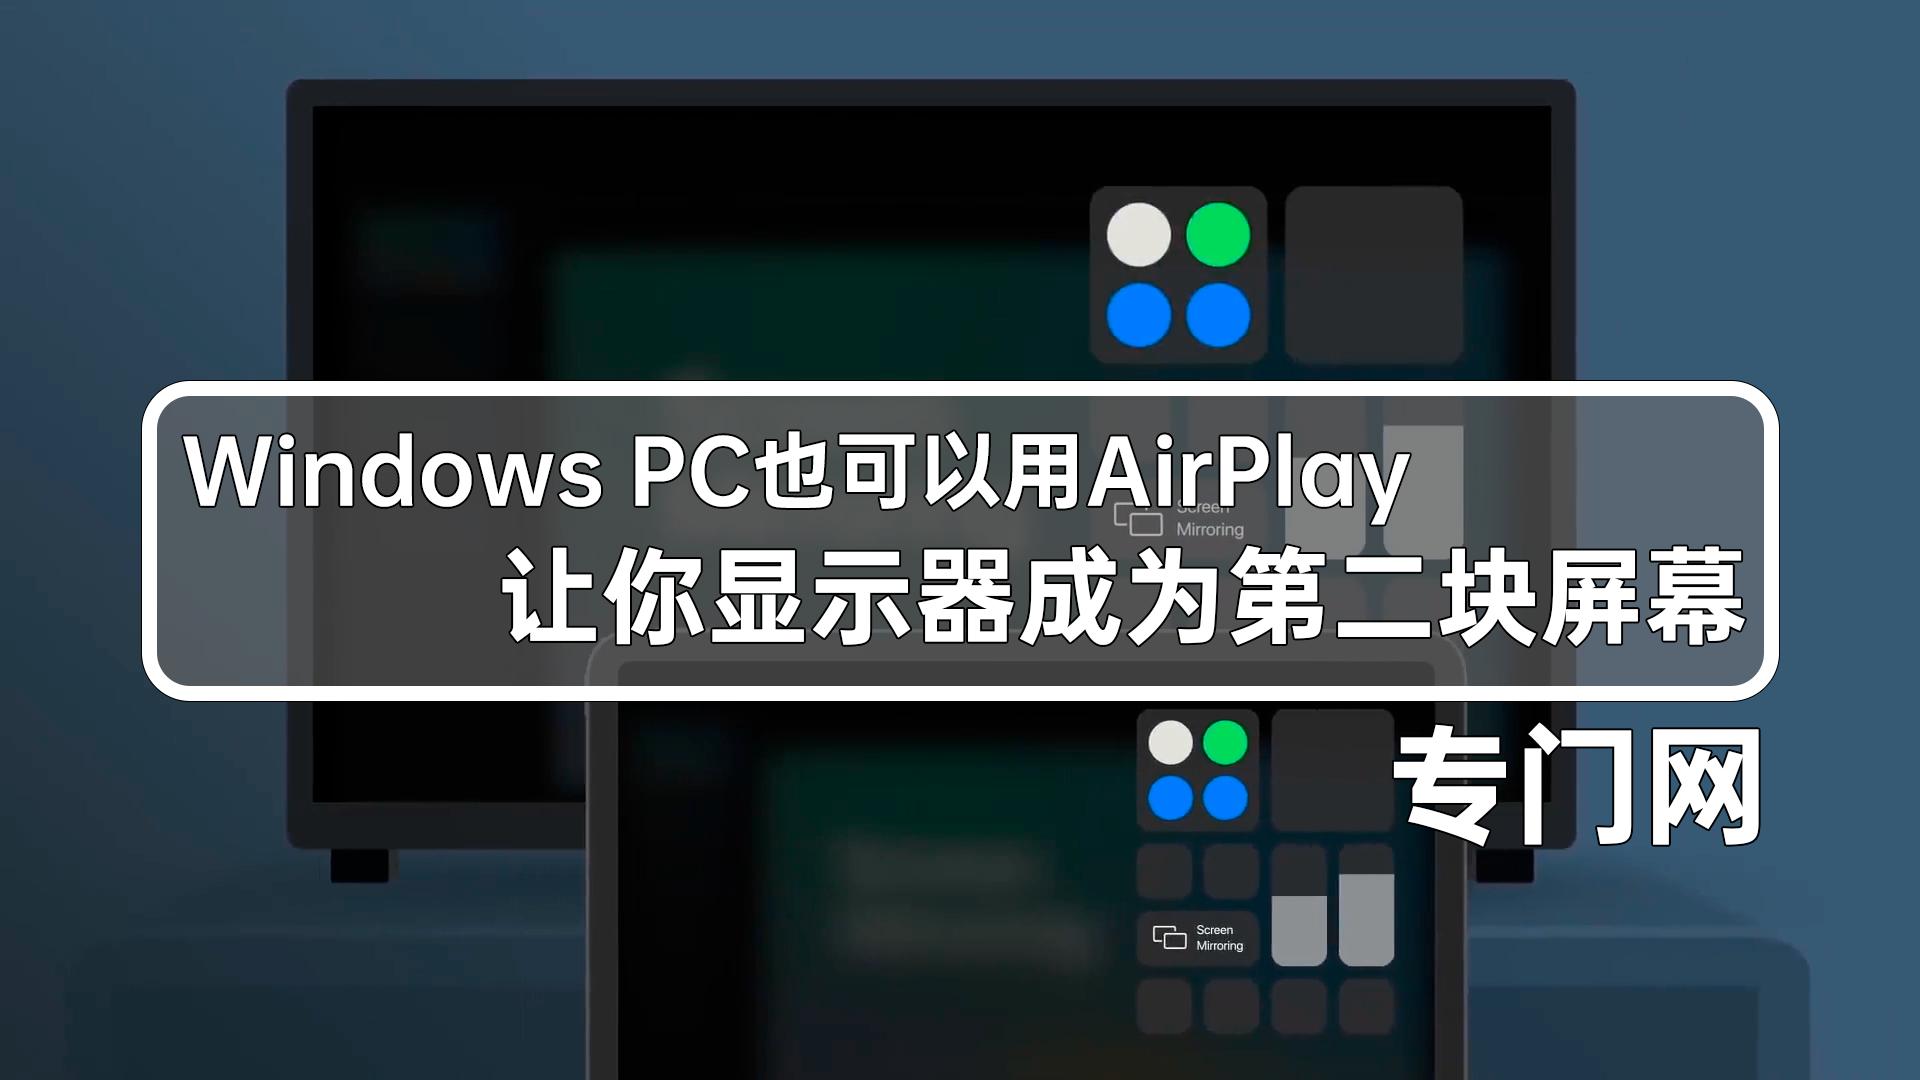 Windows PC照样能使用AirPlay 让你的显示器成为第二块屏幕